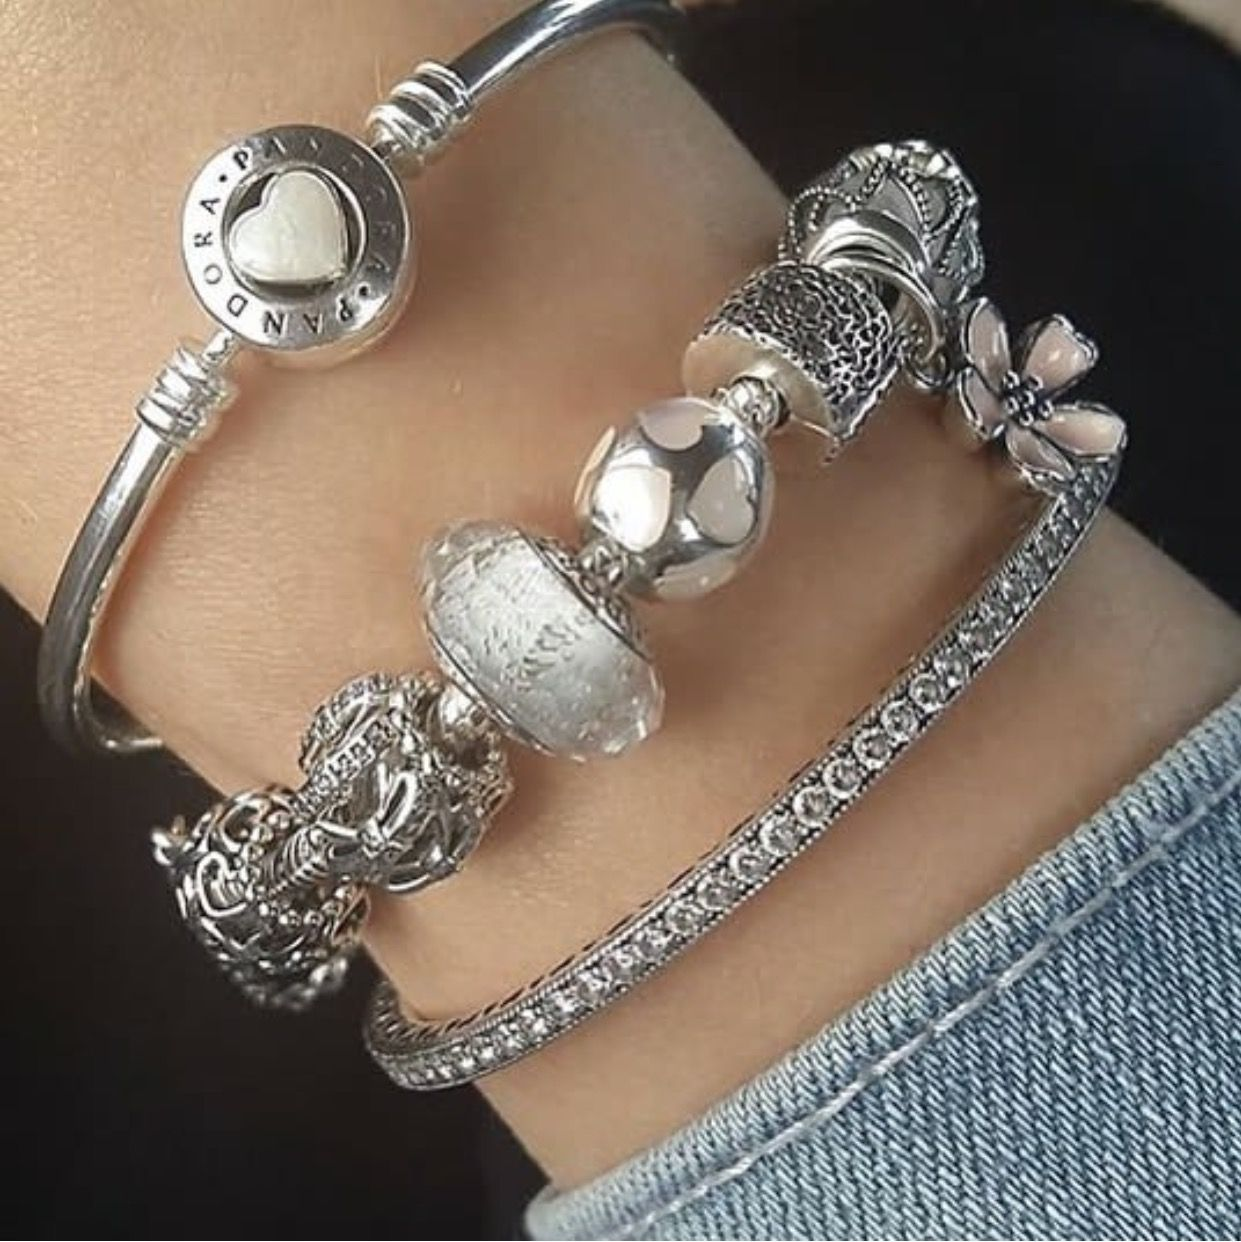 Pin by Andra Roxana on Pandora | Pinterest | Bracelets, Jewerly and Diva